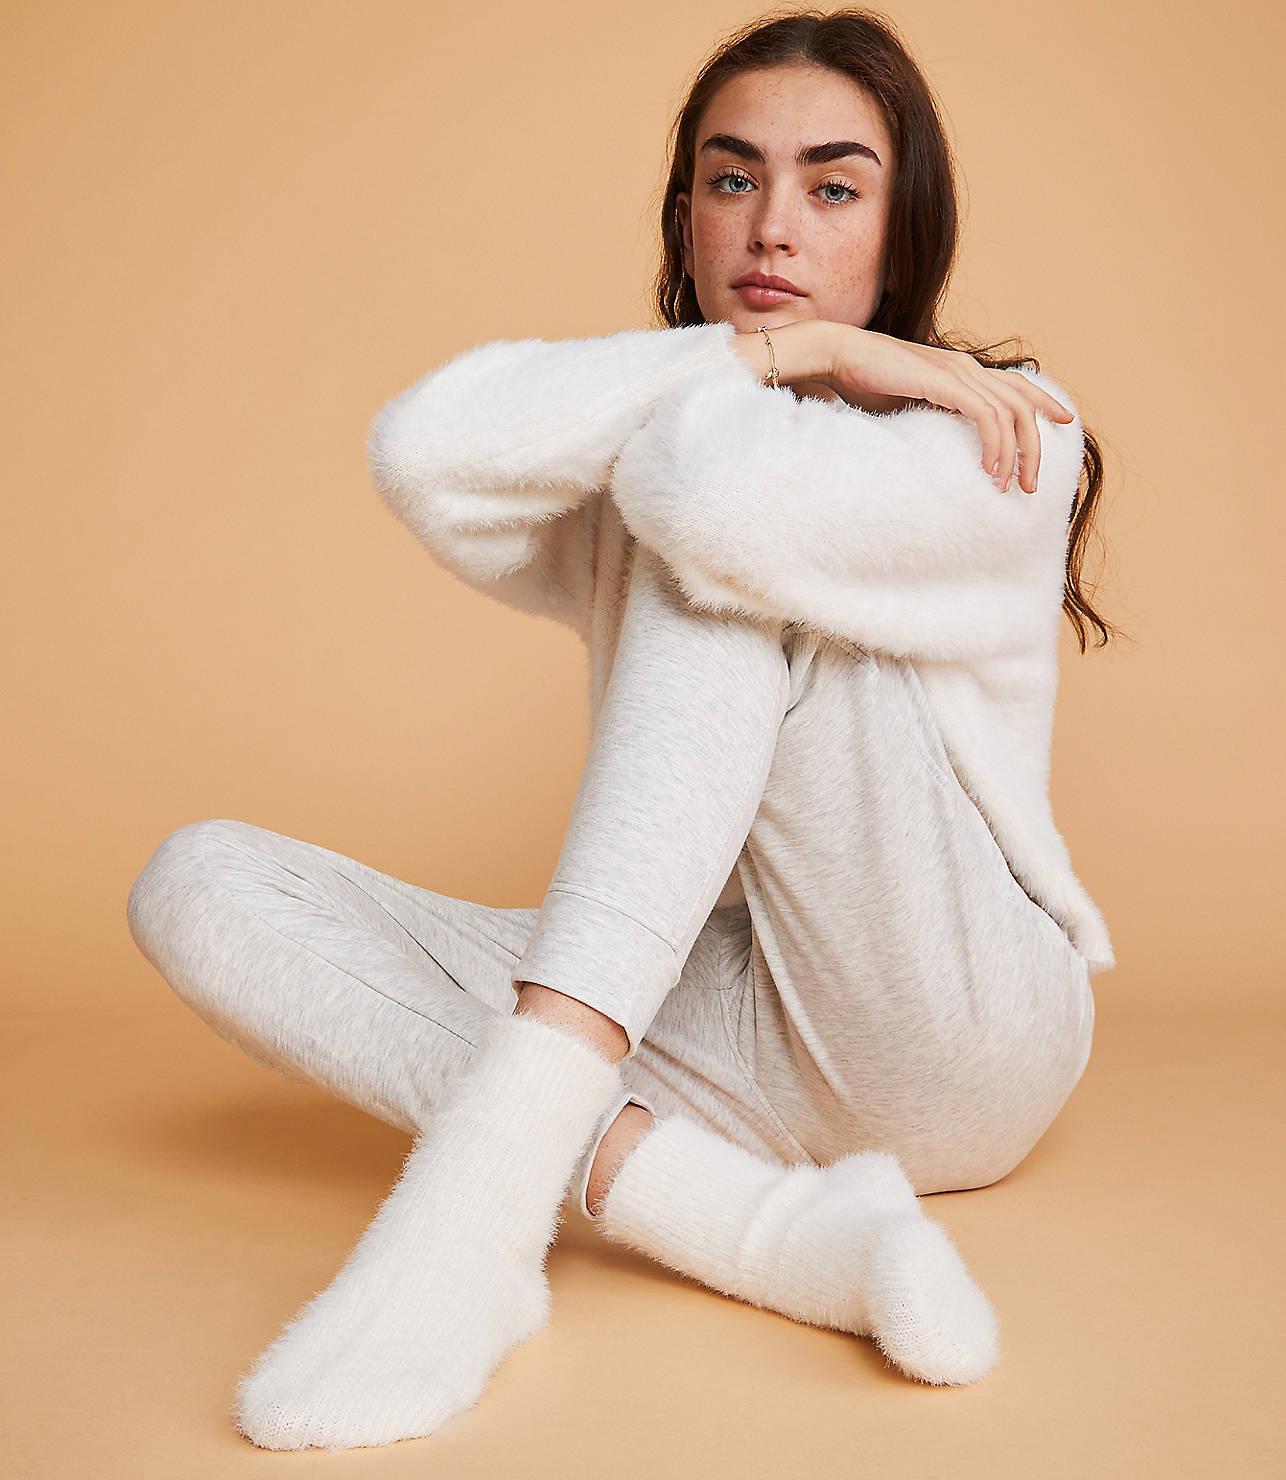 Lashout Socks by Lou & Grey